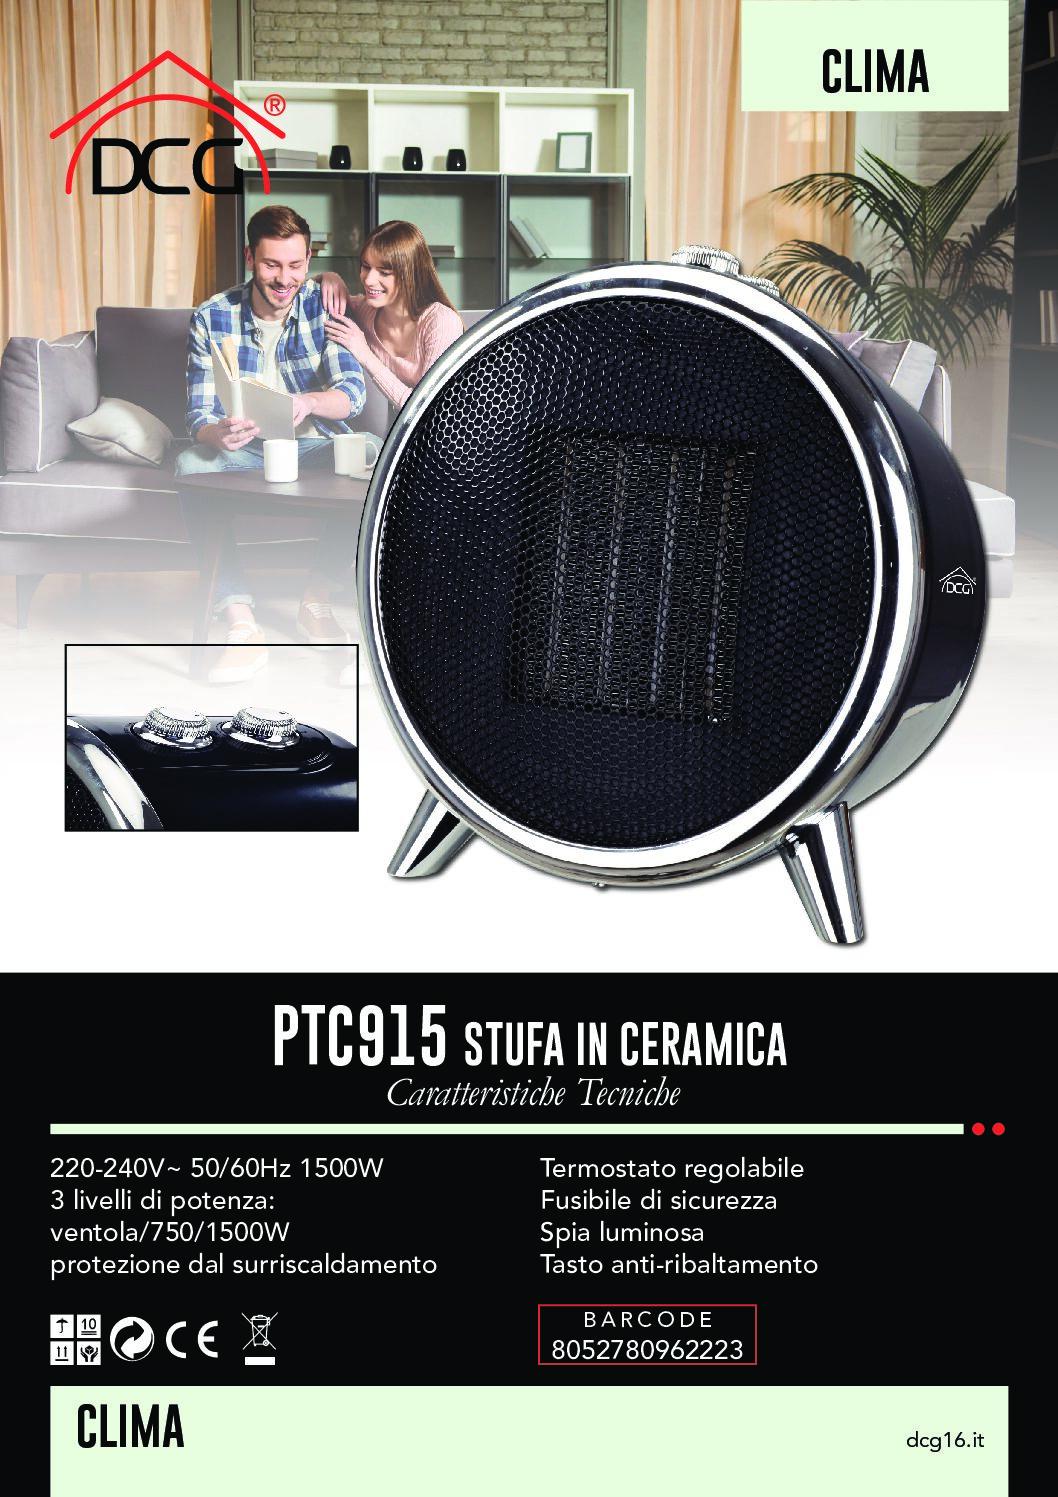 PTC915